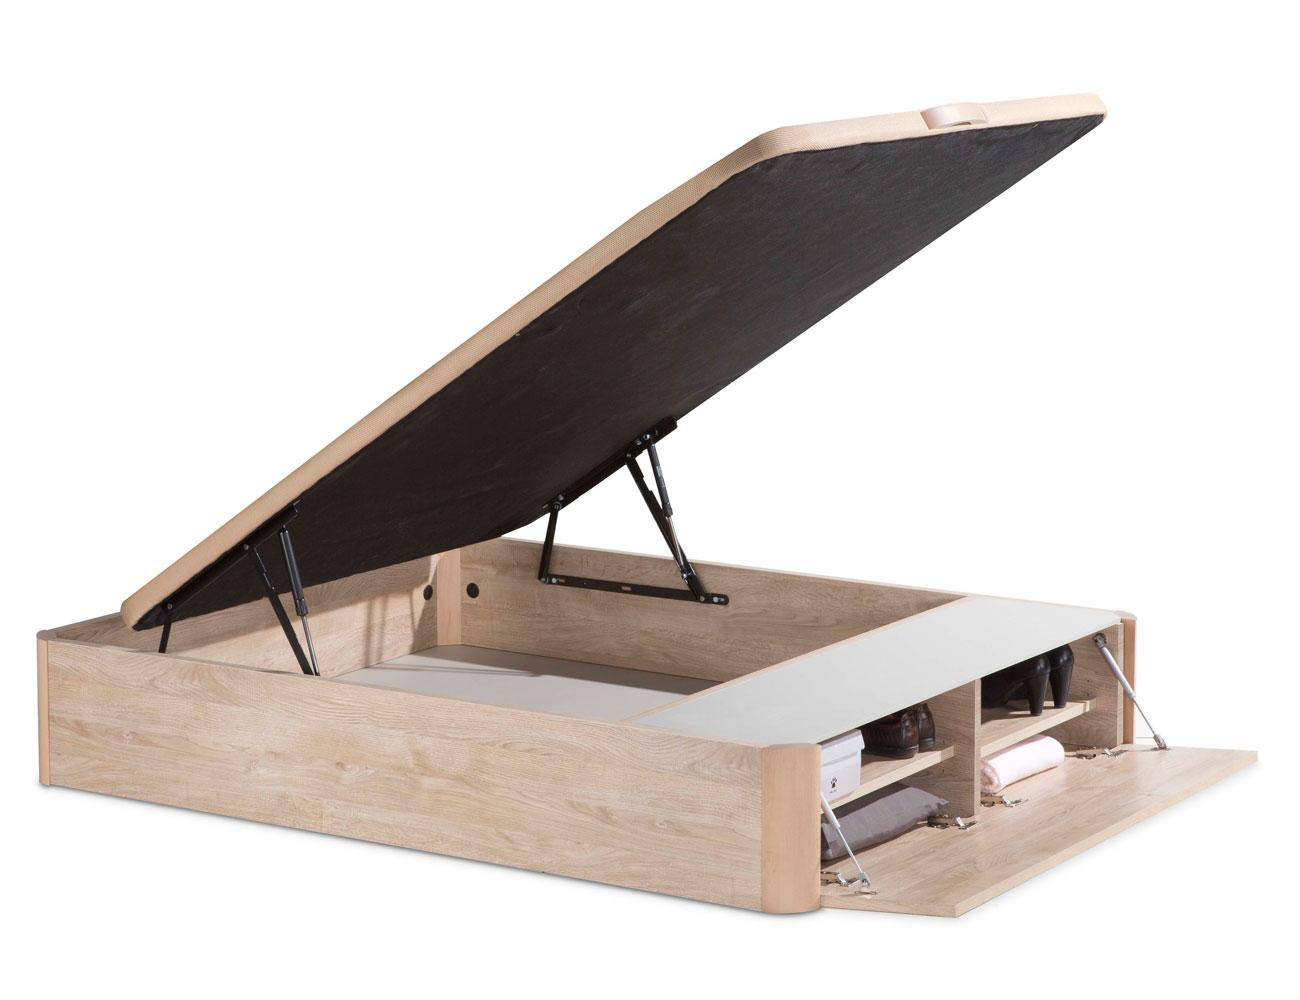 Canape zapatero madera tapa 3d 762